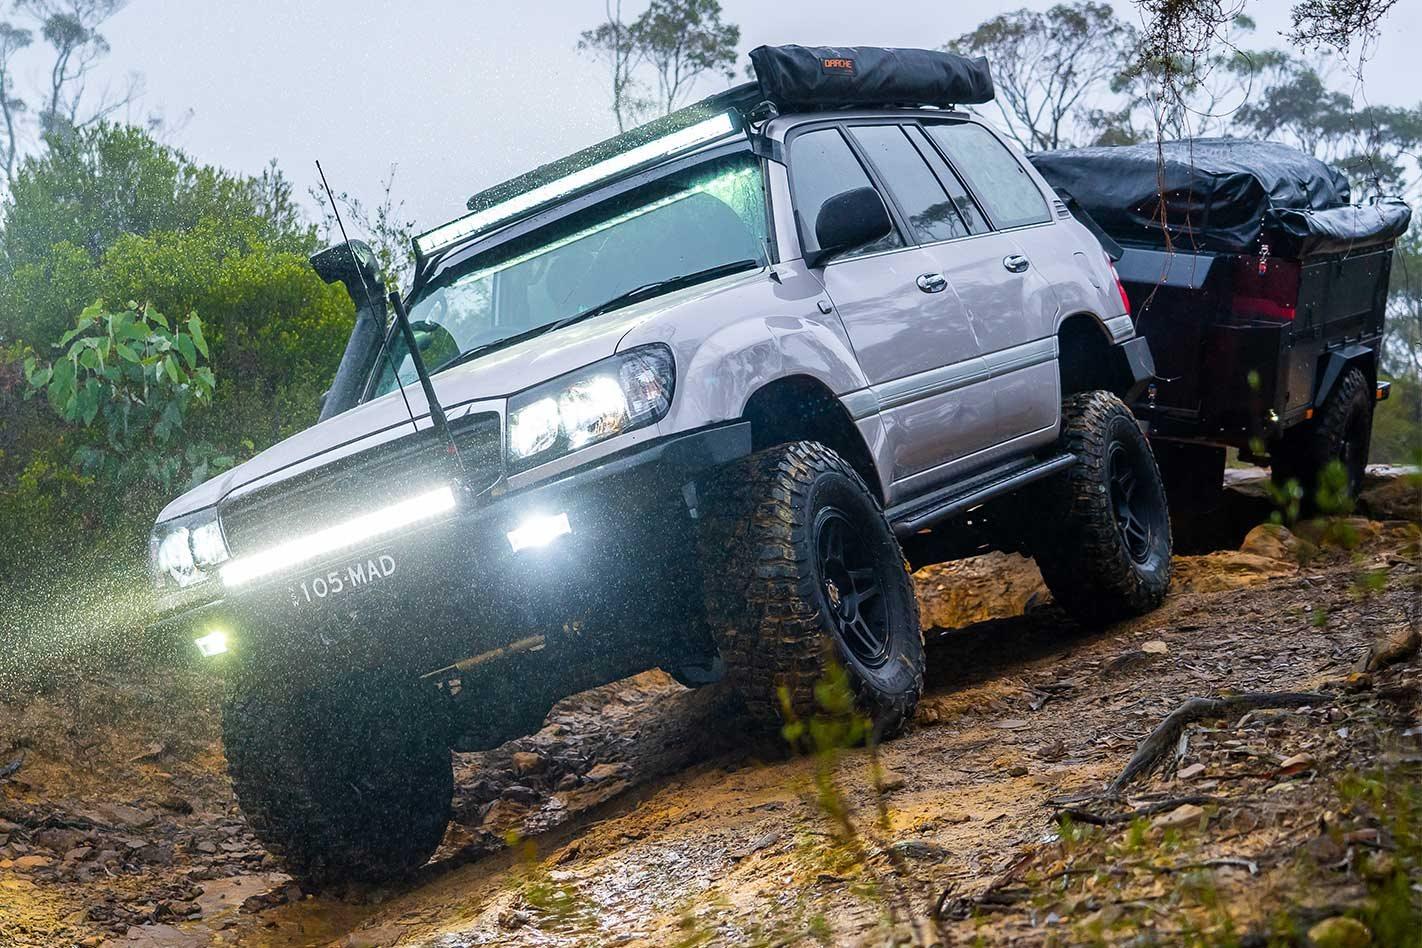 Kelebihan Toyota Land Cruiser 105 Perbandingan Harga